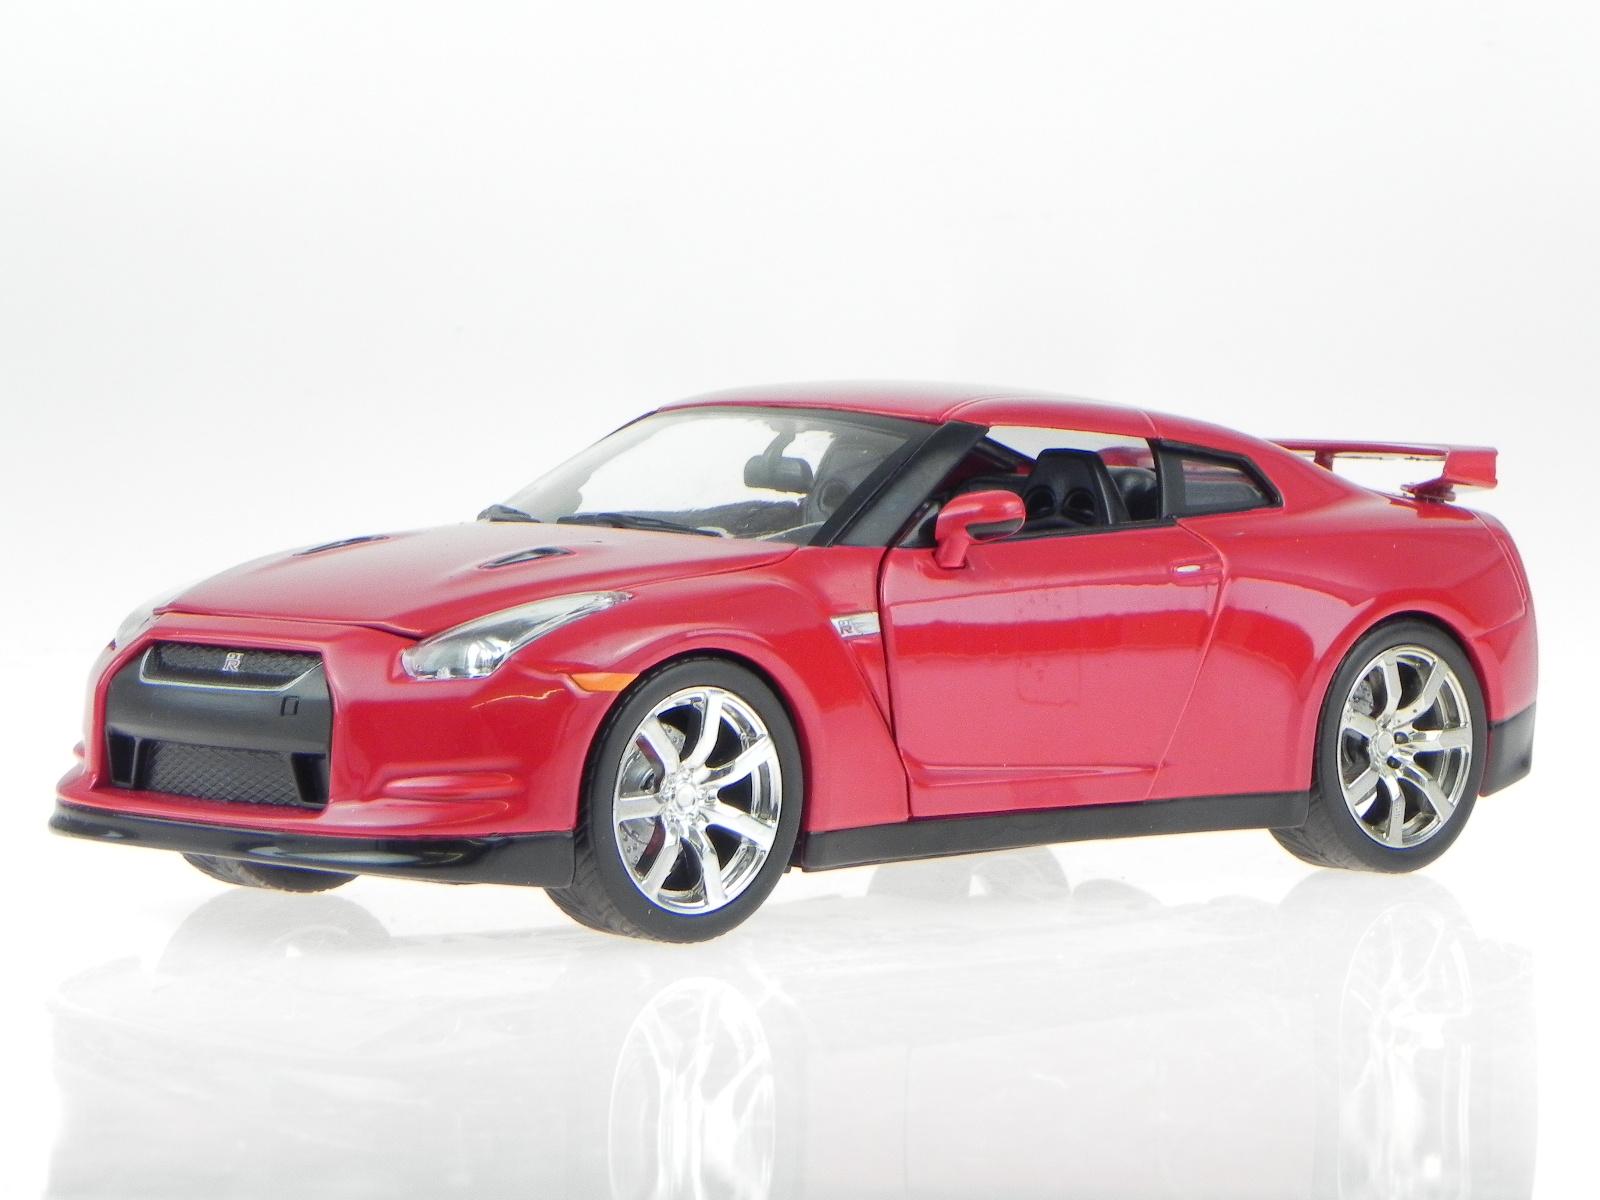 nissan gt r 2009 rot modellauto 96811 jada 1 24 ebay. Black Bedroom Furniture Sets. Home Design Ideas